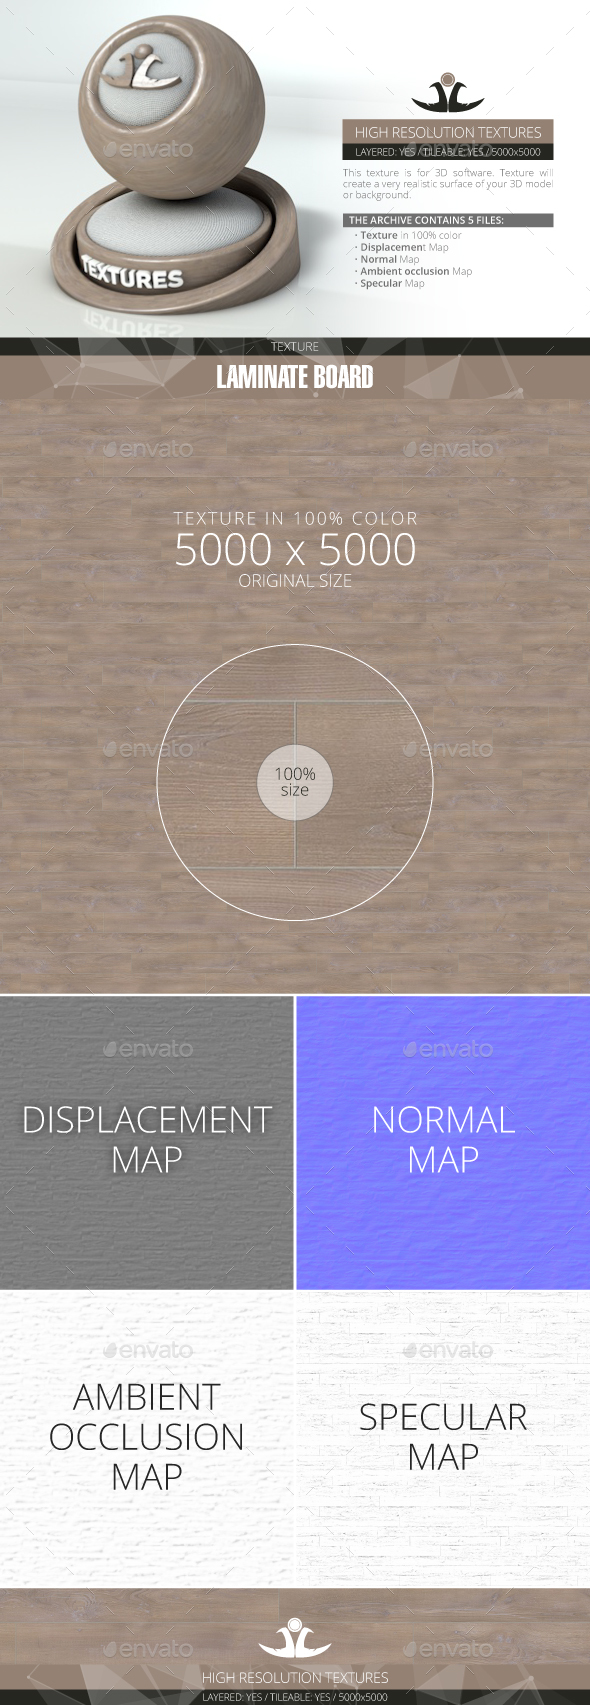 Laminate Board 71 - 3DOcean Item for Sale